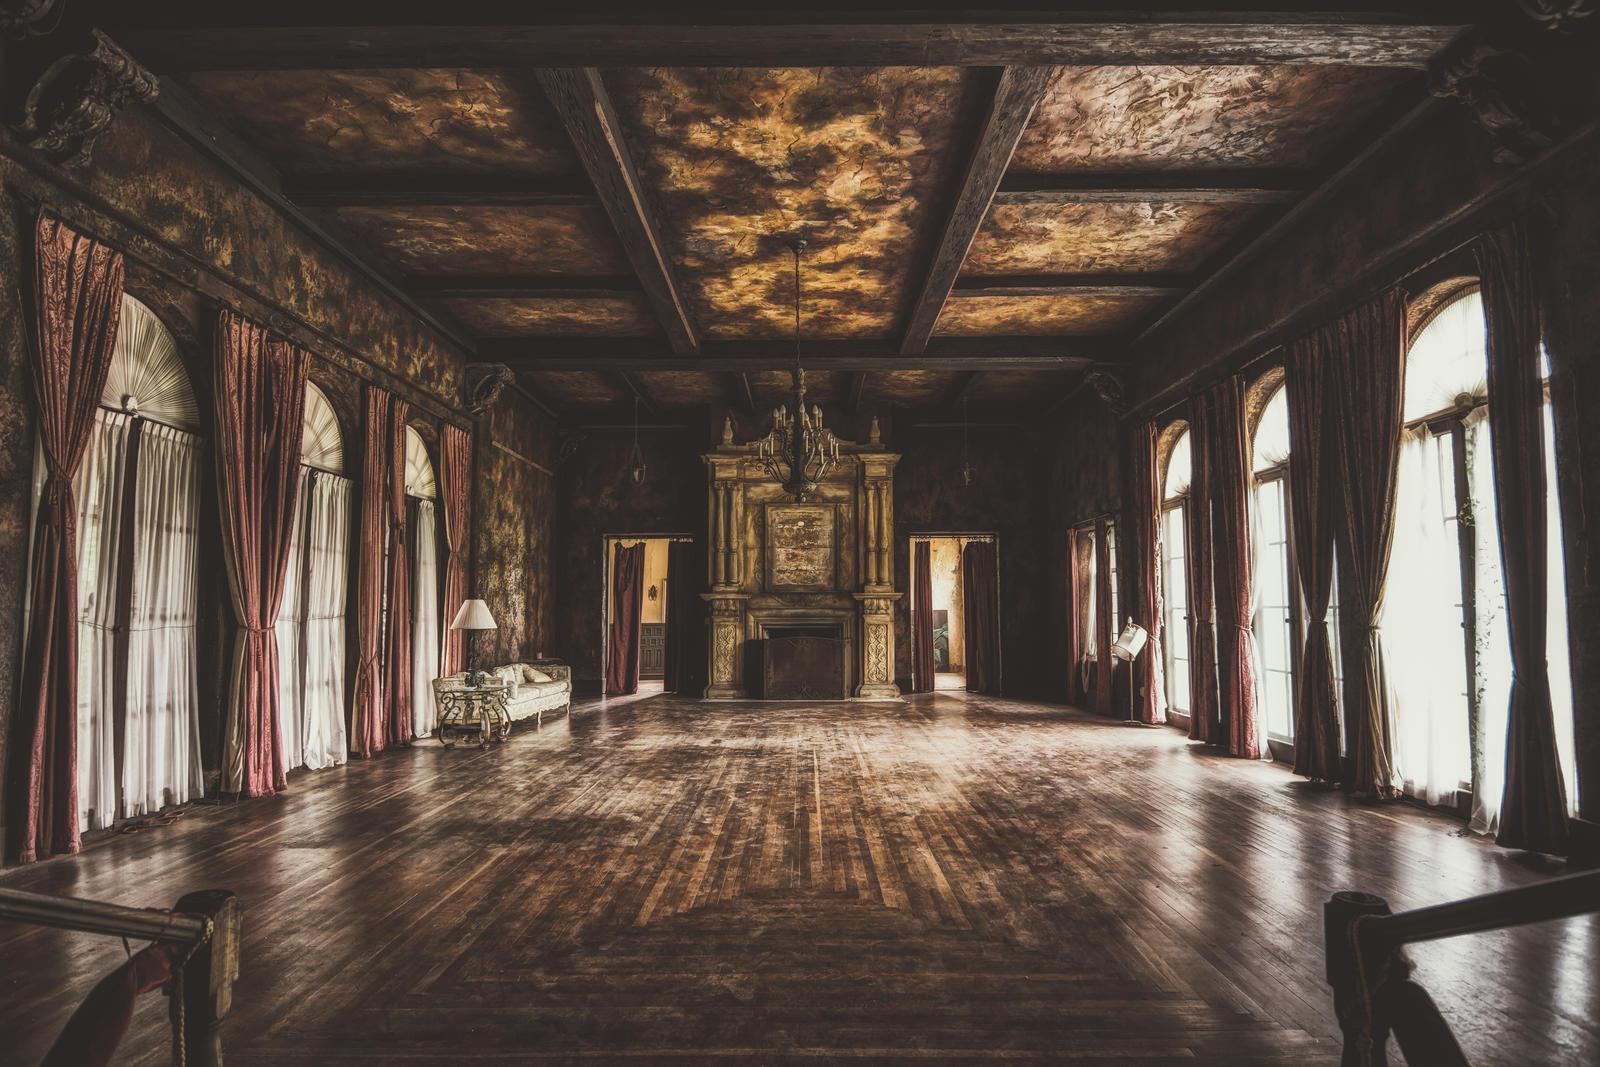 Howey mansion grand ballroom by royalimageryjax on deviantart for Mansion floor plans with ballroom